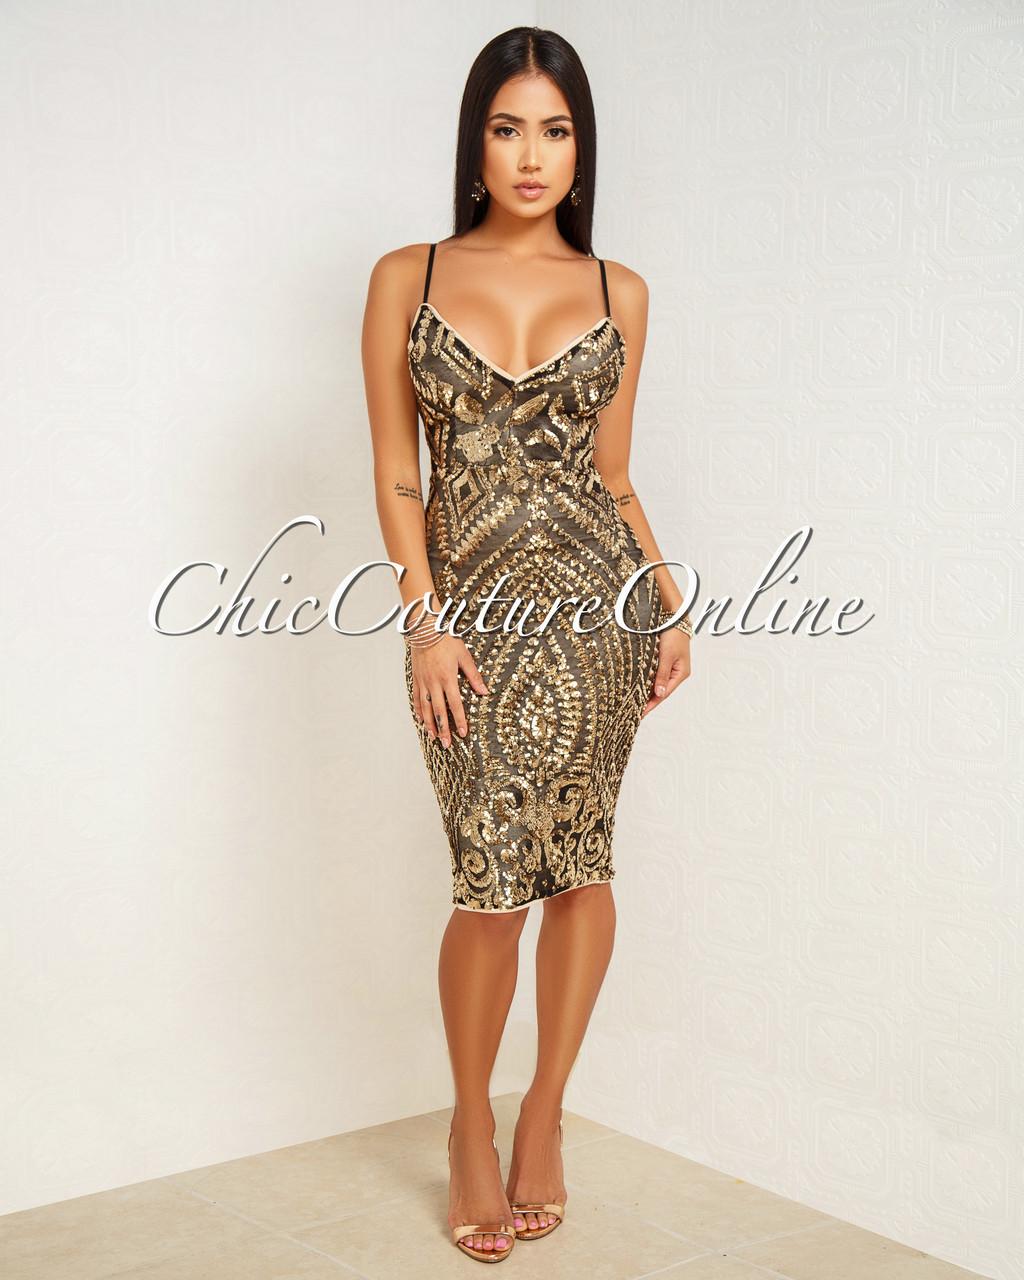 75de14e9e279 Santorina Black Gold Sequins Nude Illusion Midi Dress